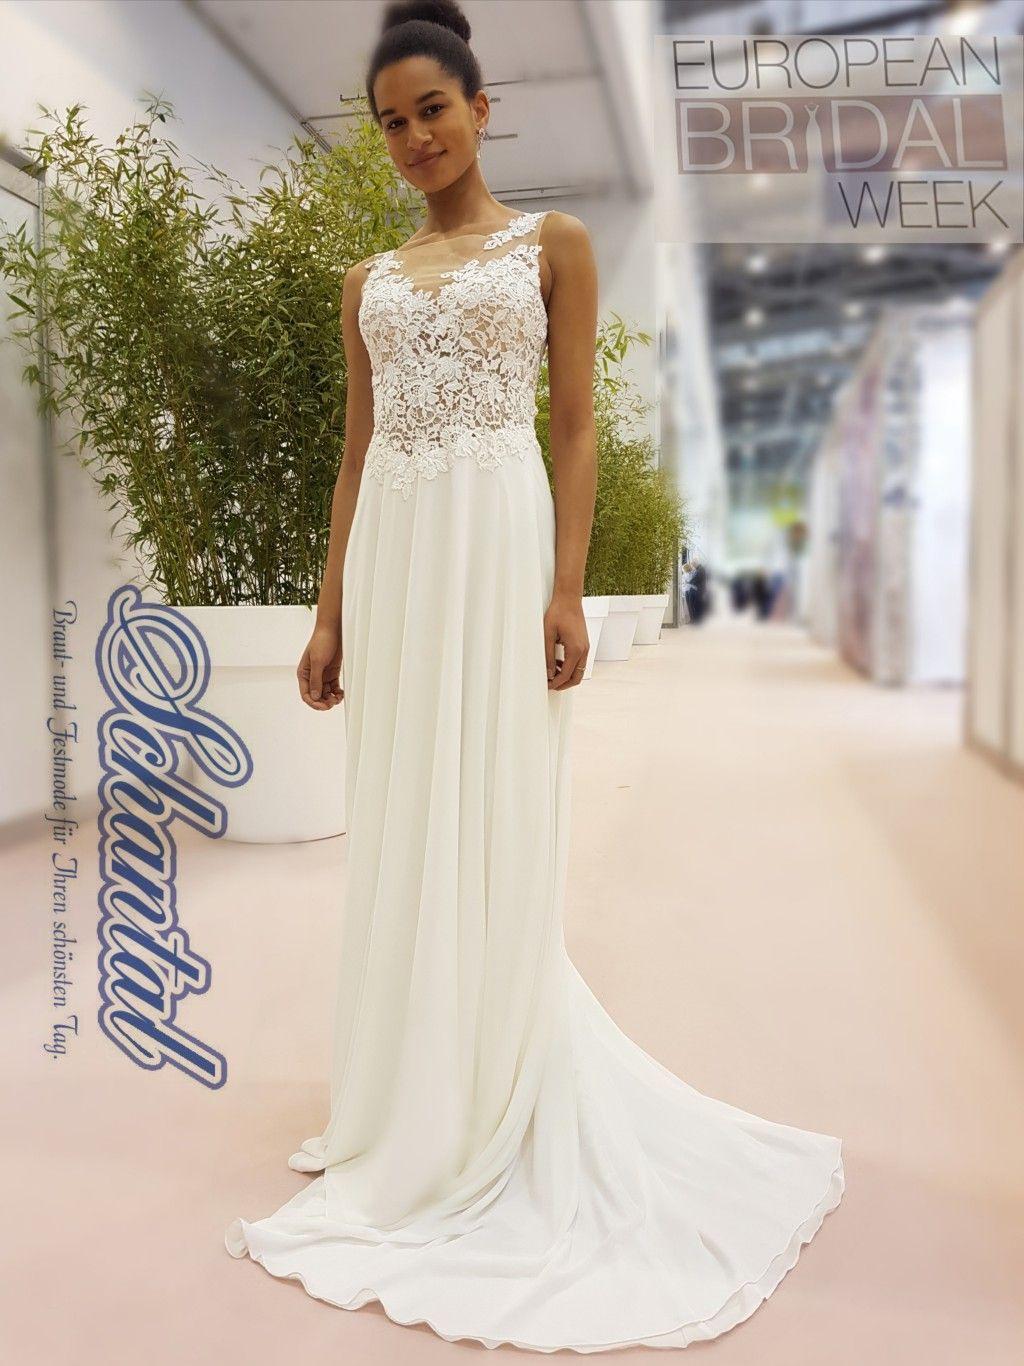 Brautkleid / Hochzeitskleid / Wedding Dress